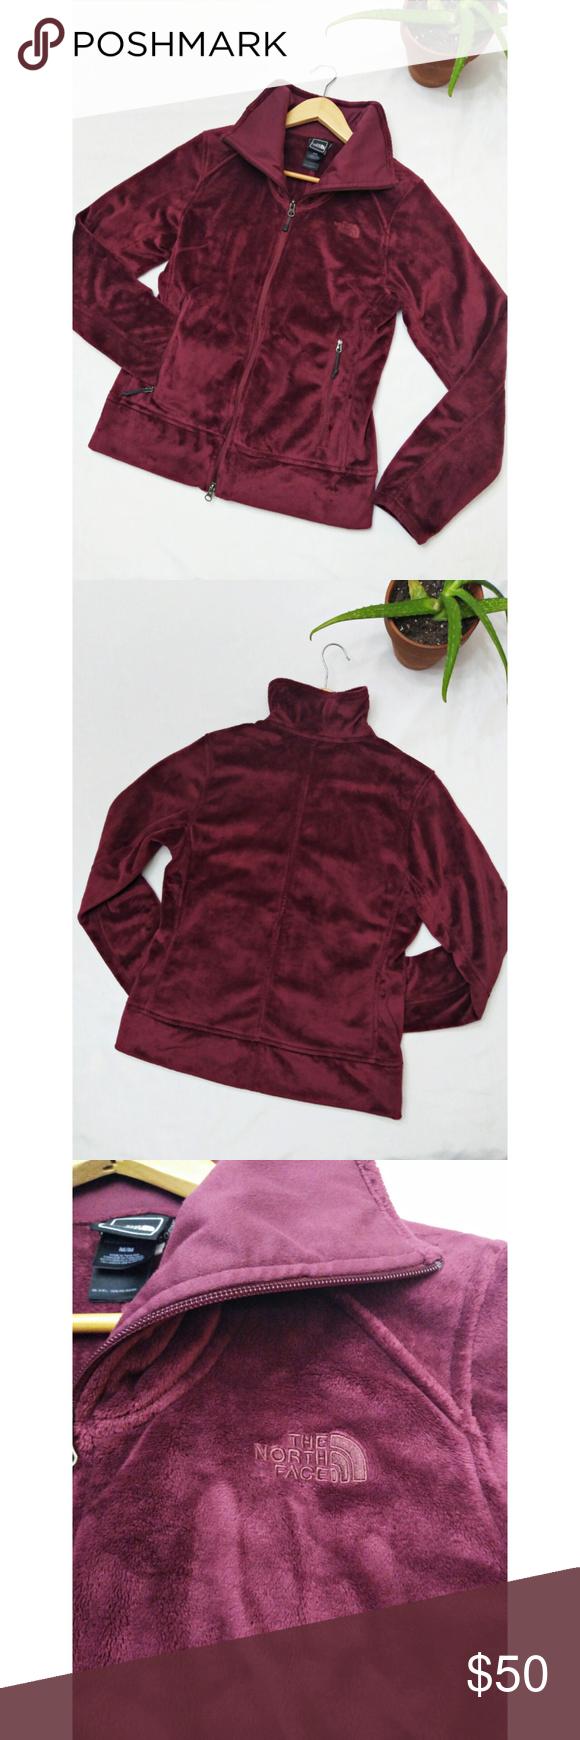 The North Face Soft Silken Fleece Shiso Jacket M Women S The North Face Shiso Full Zip Up Jacket Size Medium Burgundy Ra High Collar The North Face Jackets [ 1740 x 580 Pixel ]